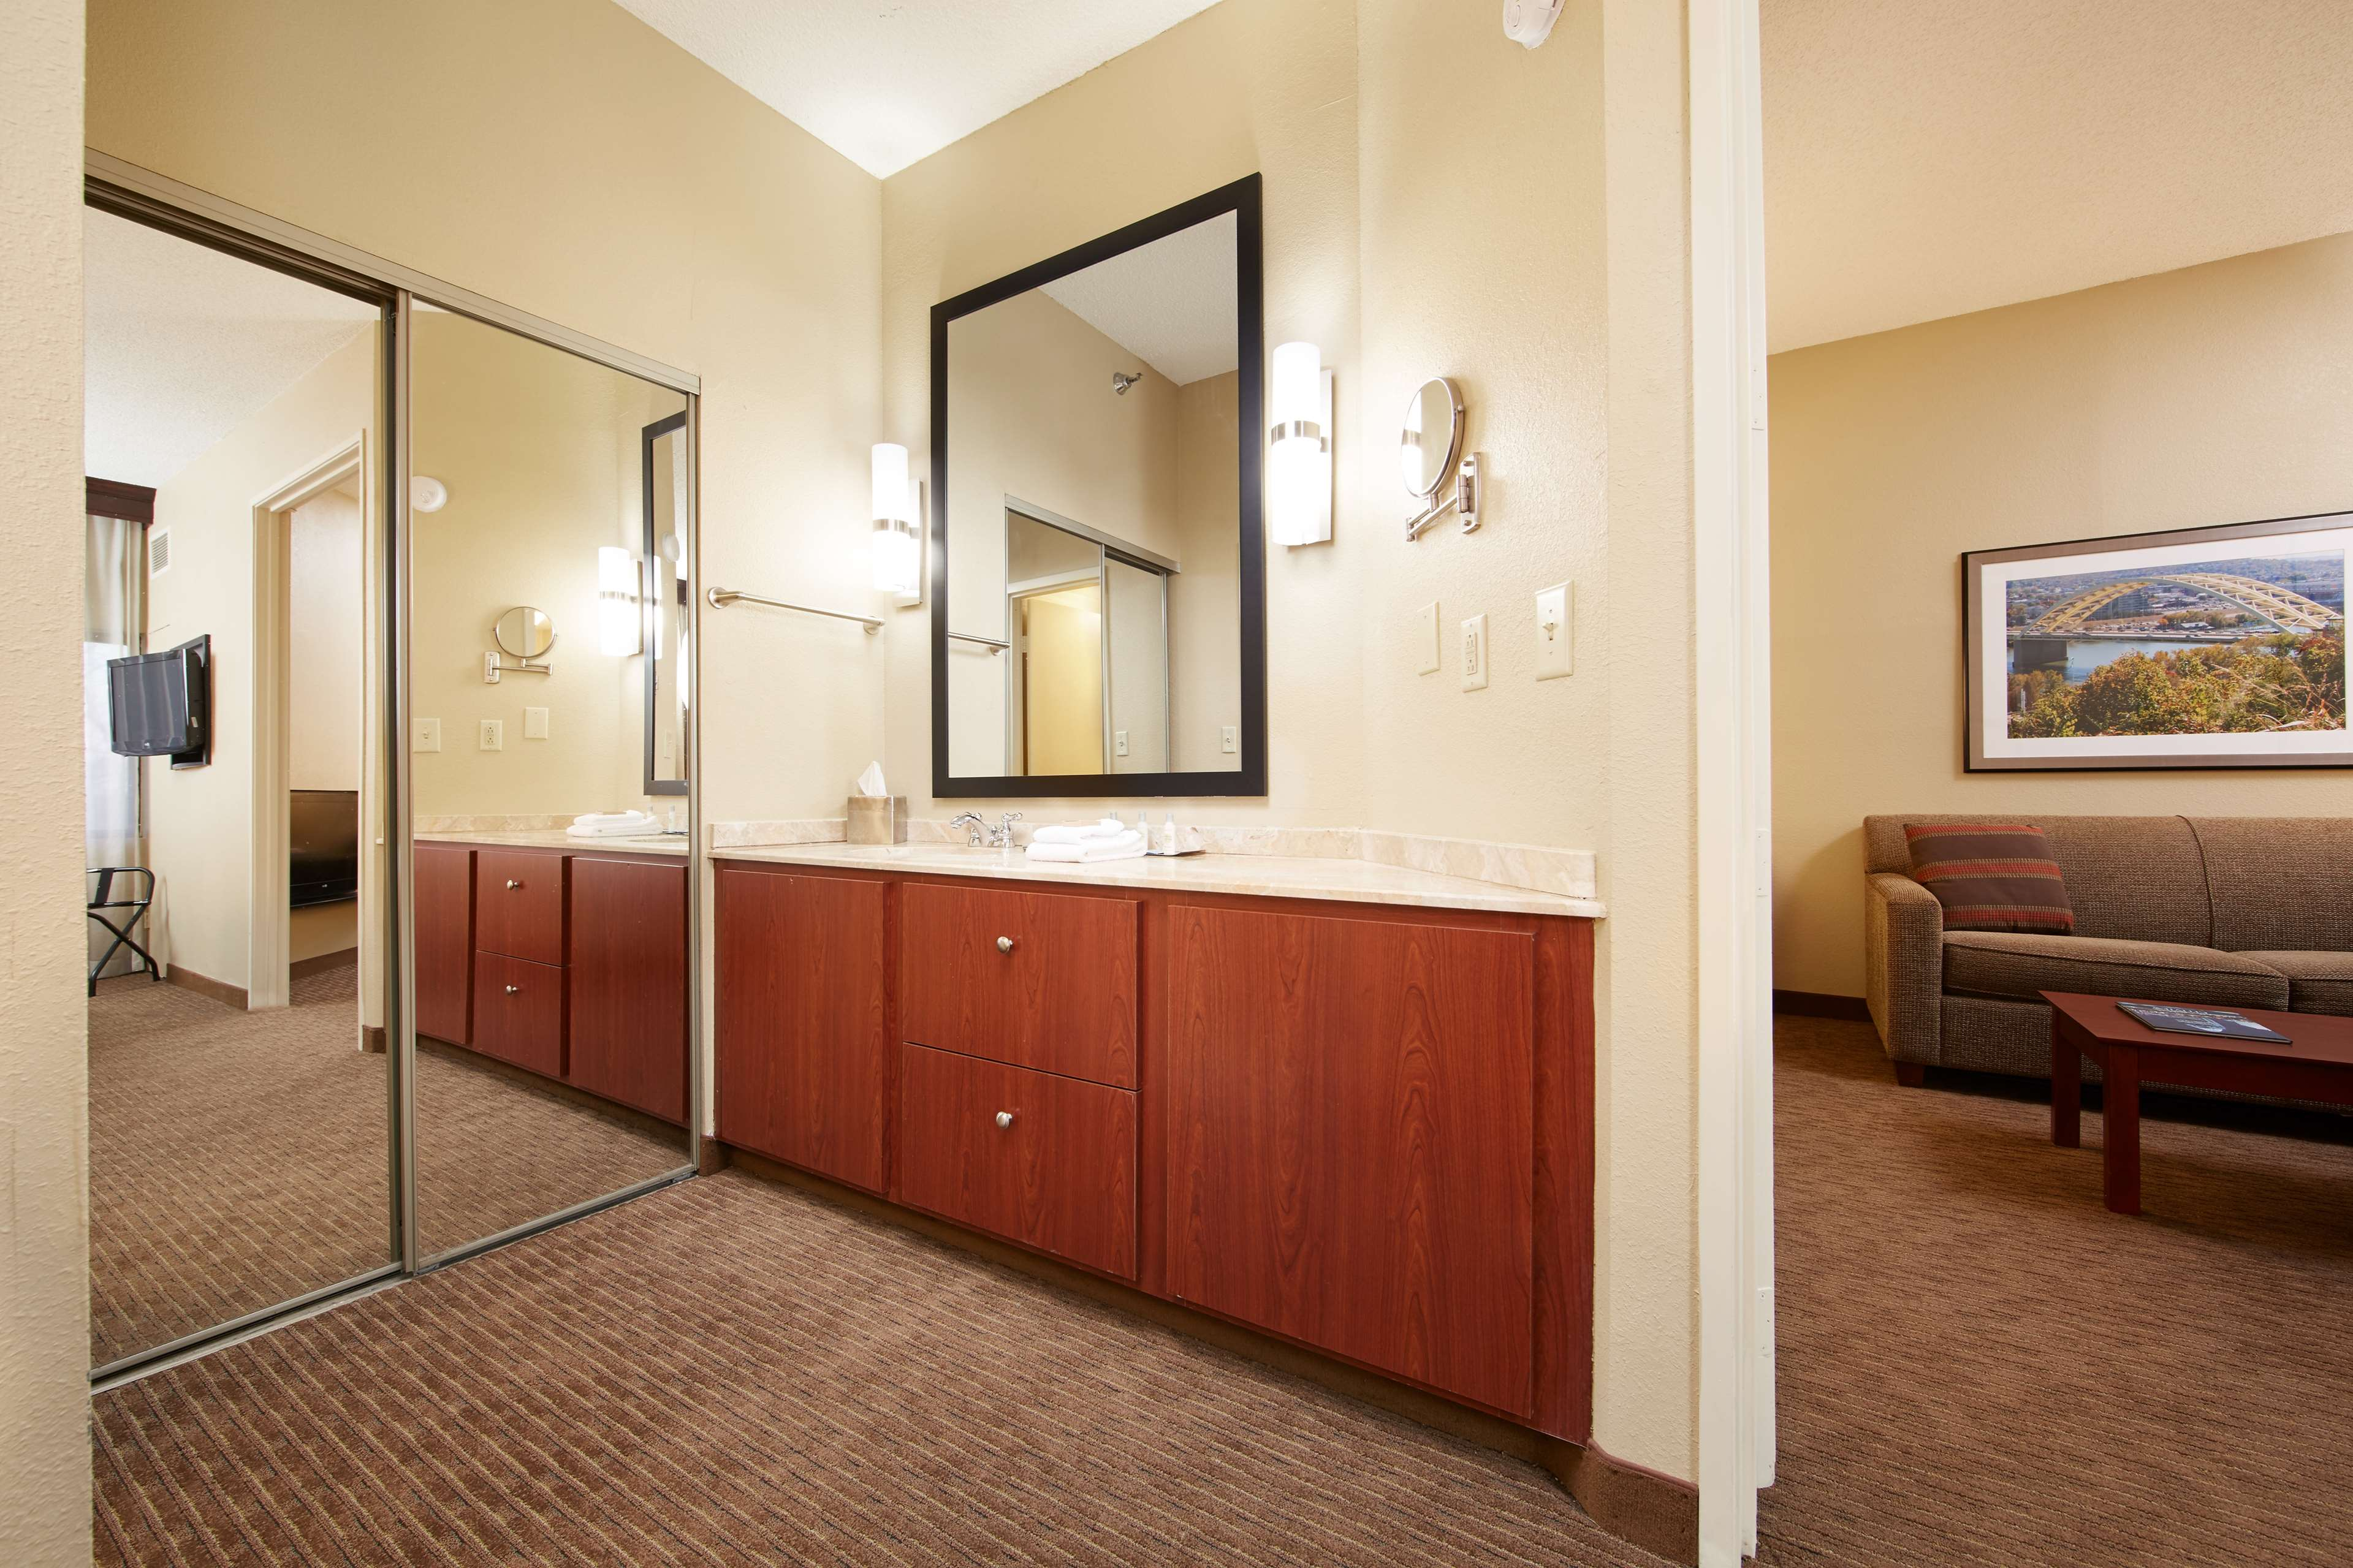 DoubleTree Suites by Hilton Hotel Cincinnati - Blue Ash image 22